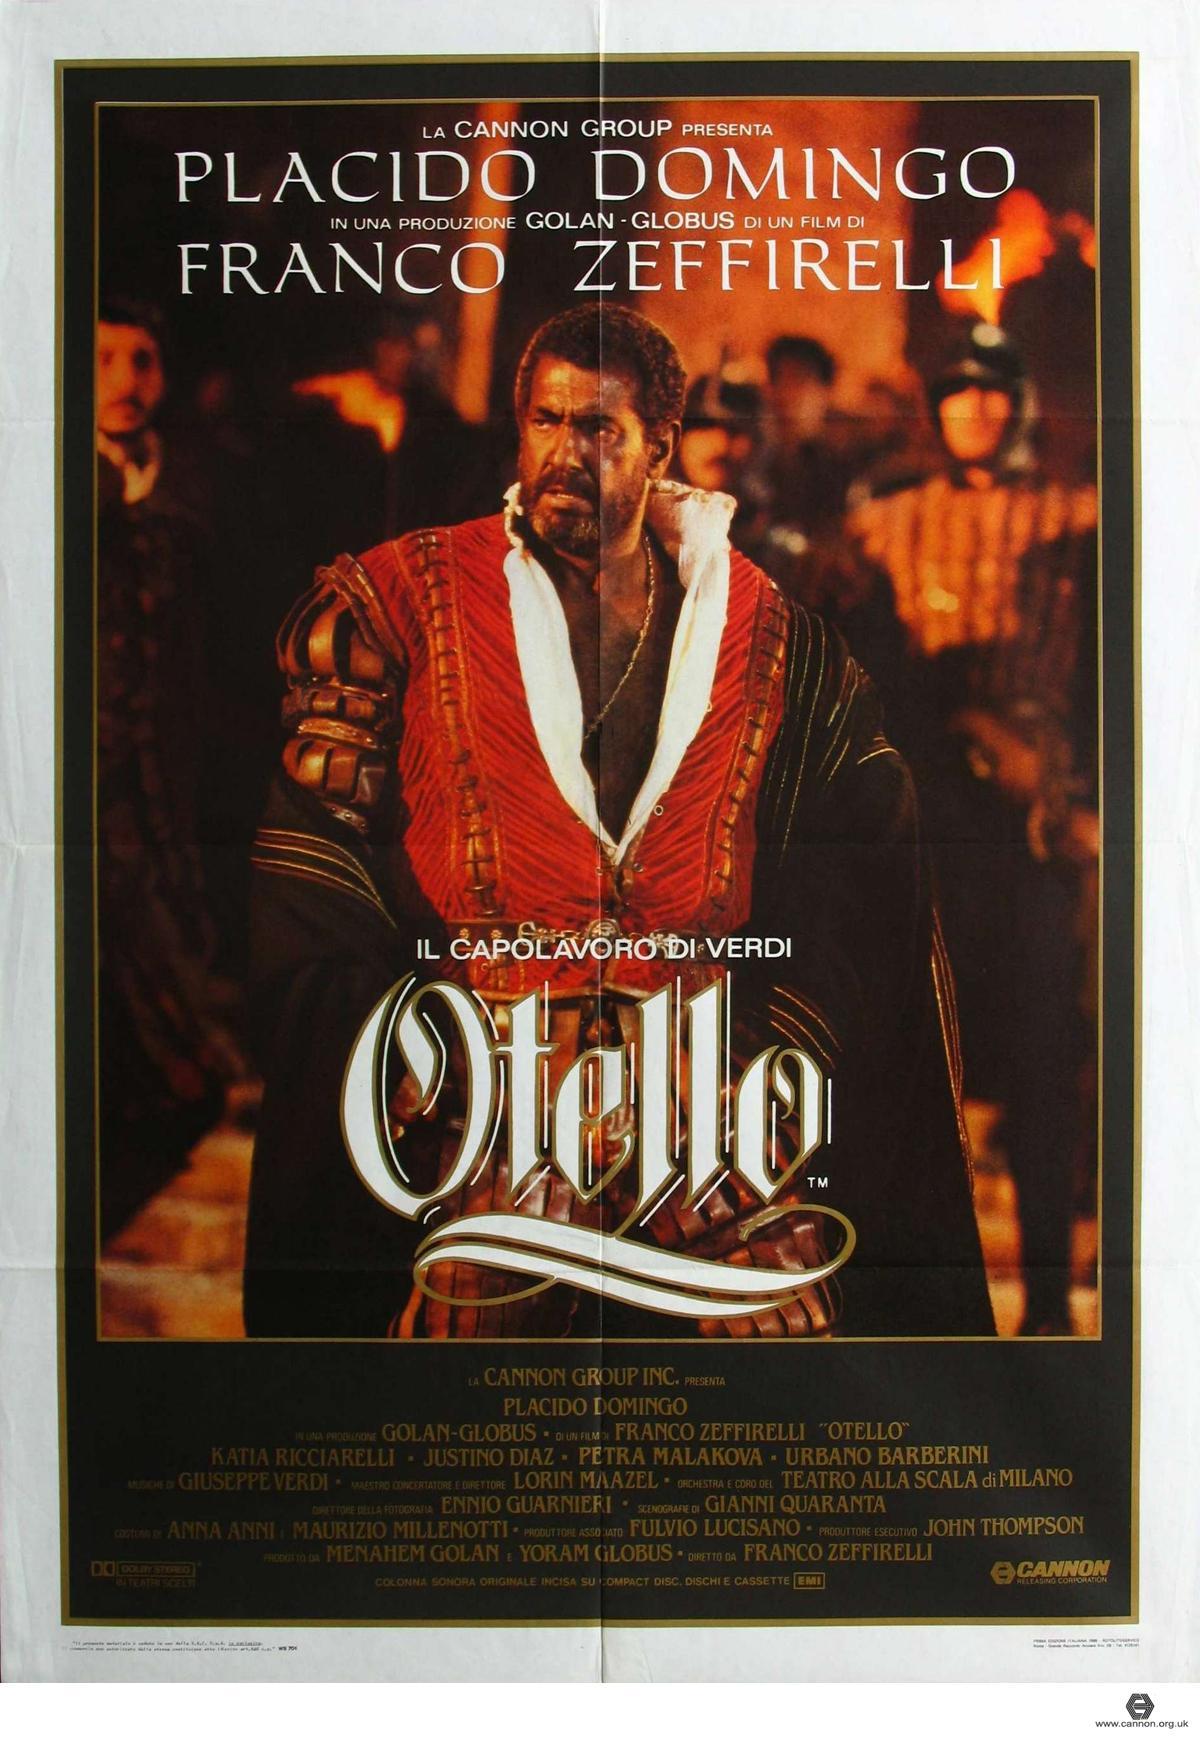 otello-1986-italy-poster.jpg